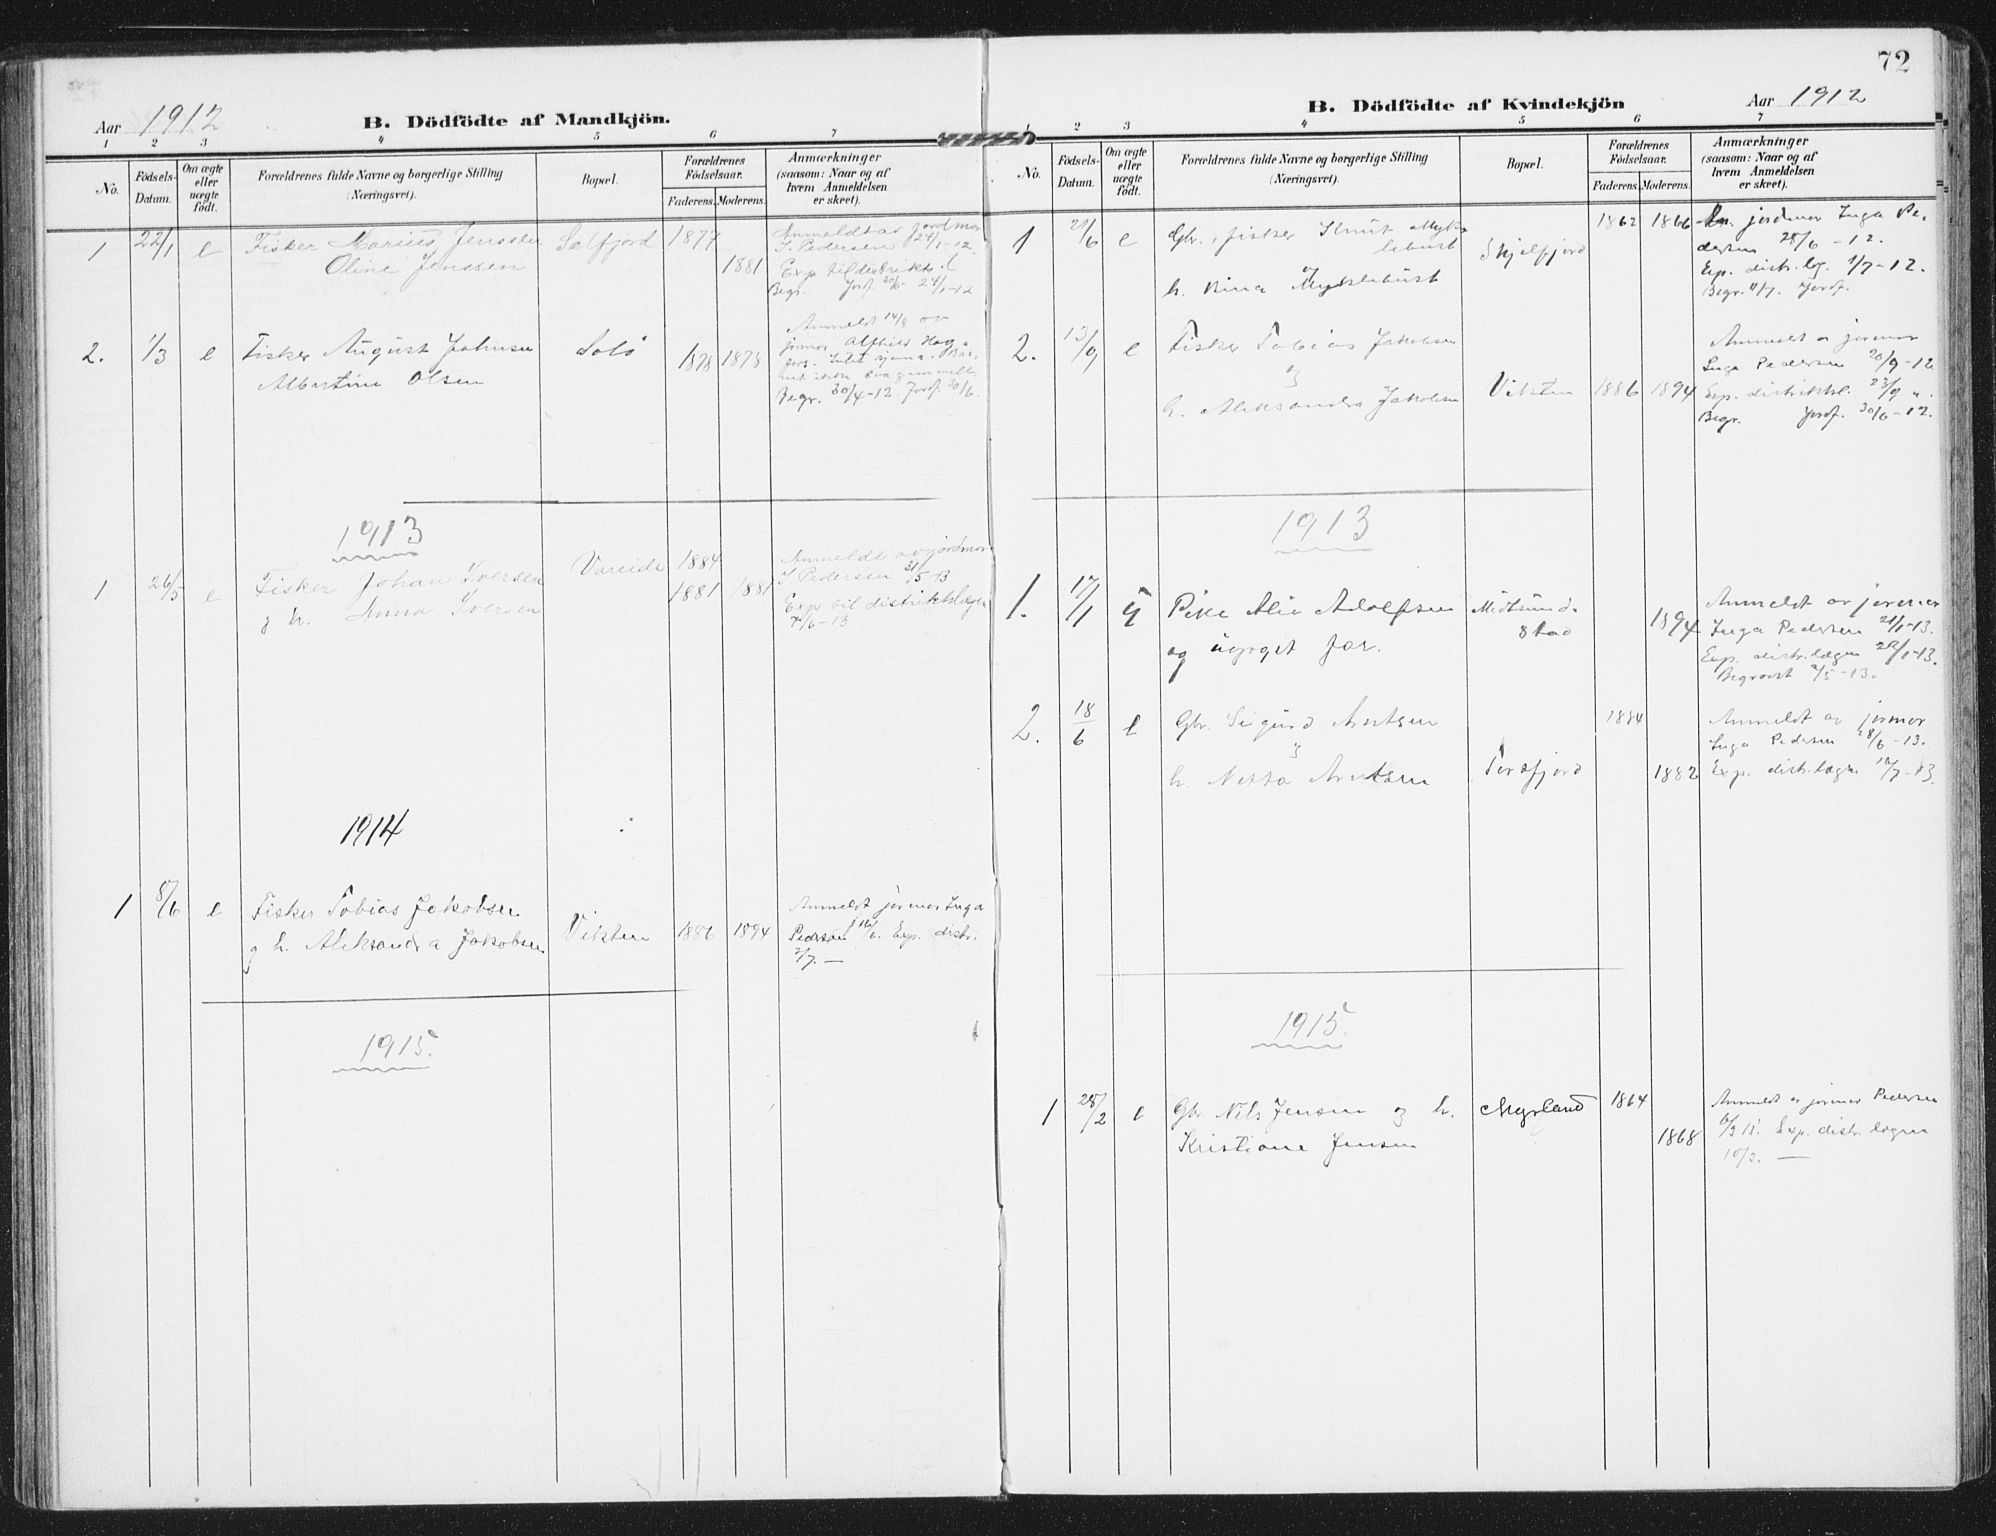 SAT, Ministerialprotokoller, klokkerbøker og fødselsregistre - Nordland, 885/L1206: Ministerialbok nr. 885A07, 1905-1915, s. 72